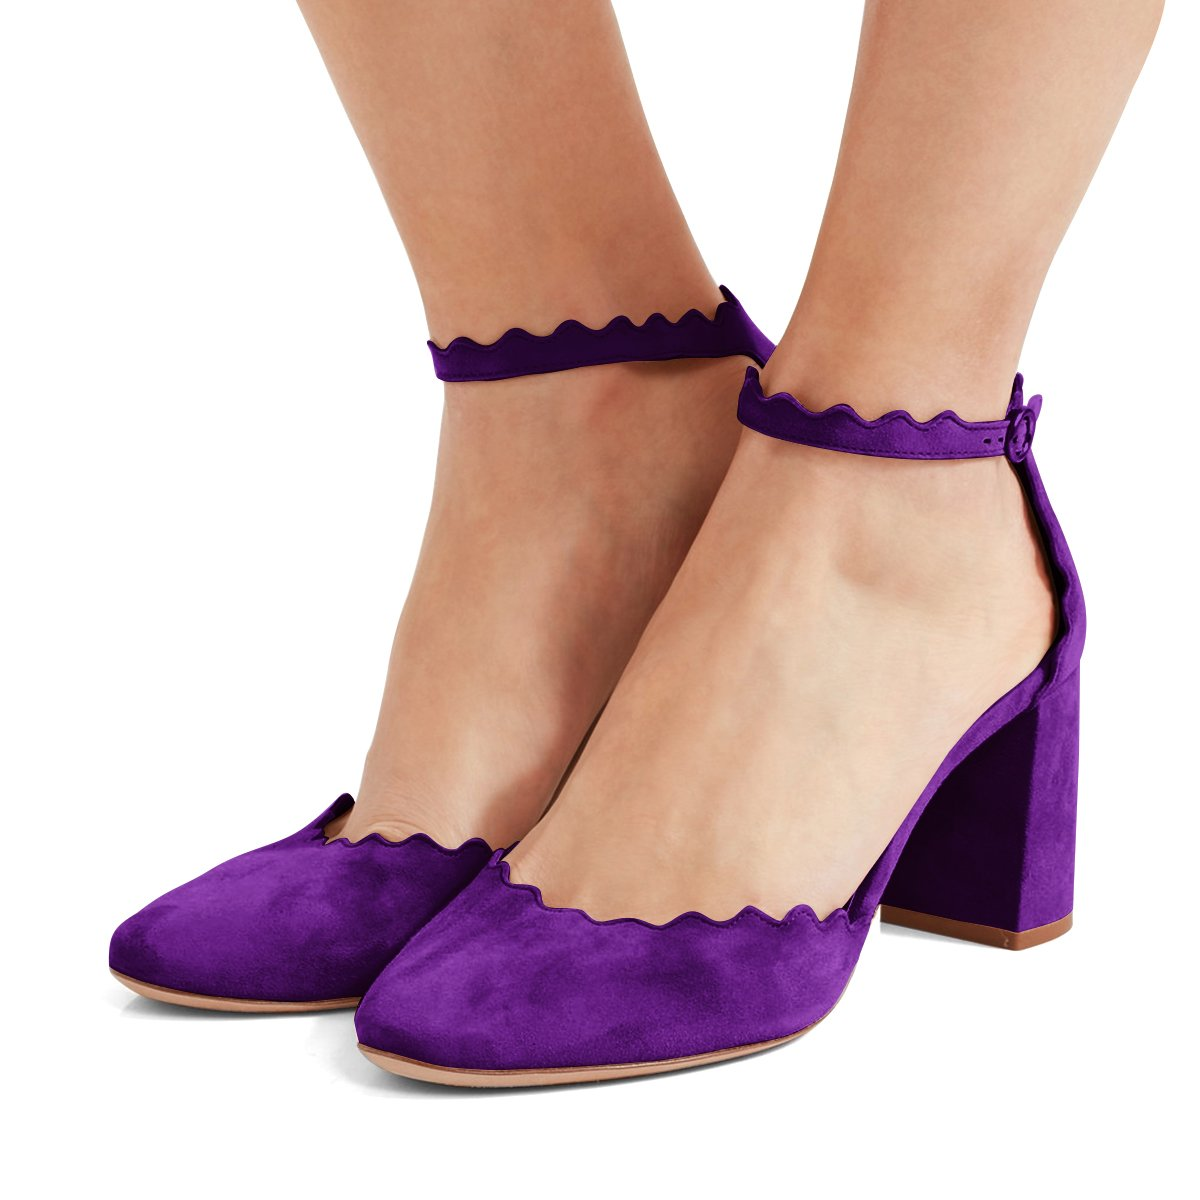 FSJ Women Comfortable Ankle Strap Pumps Block Chunky Heels Round Toe D'Orsay Shoes Size 4-15 US B078J5GTB4 5 M US|Purple